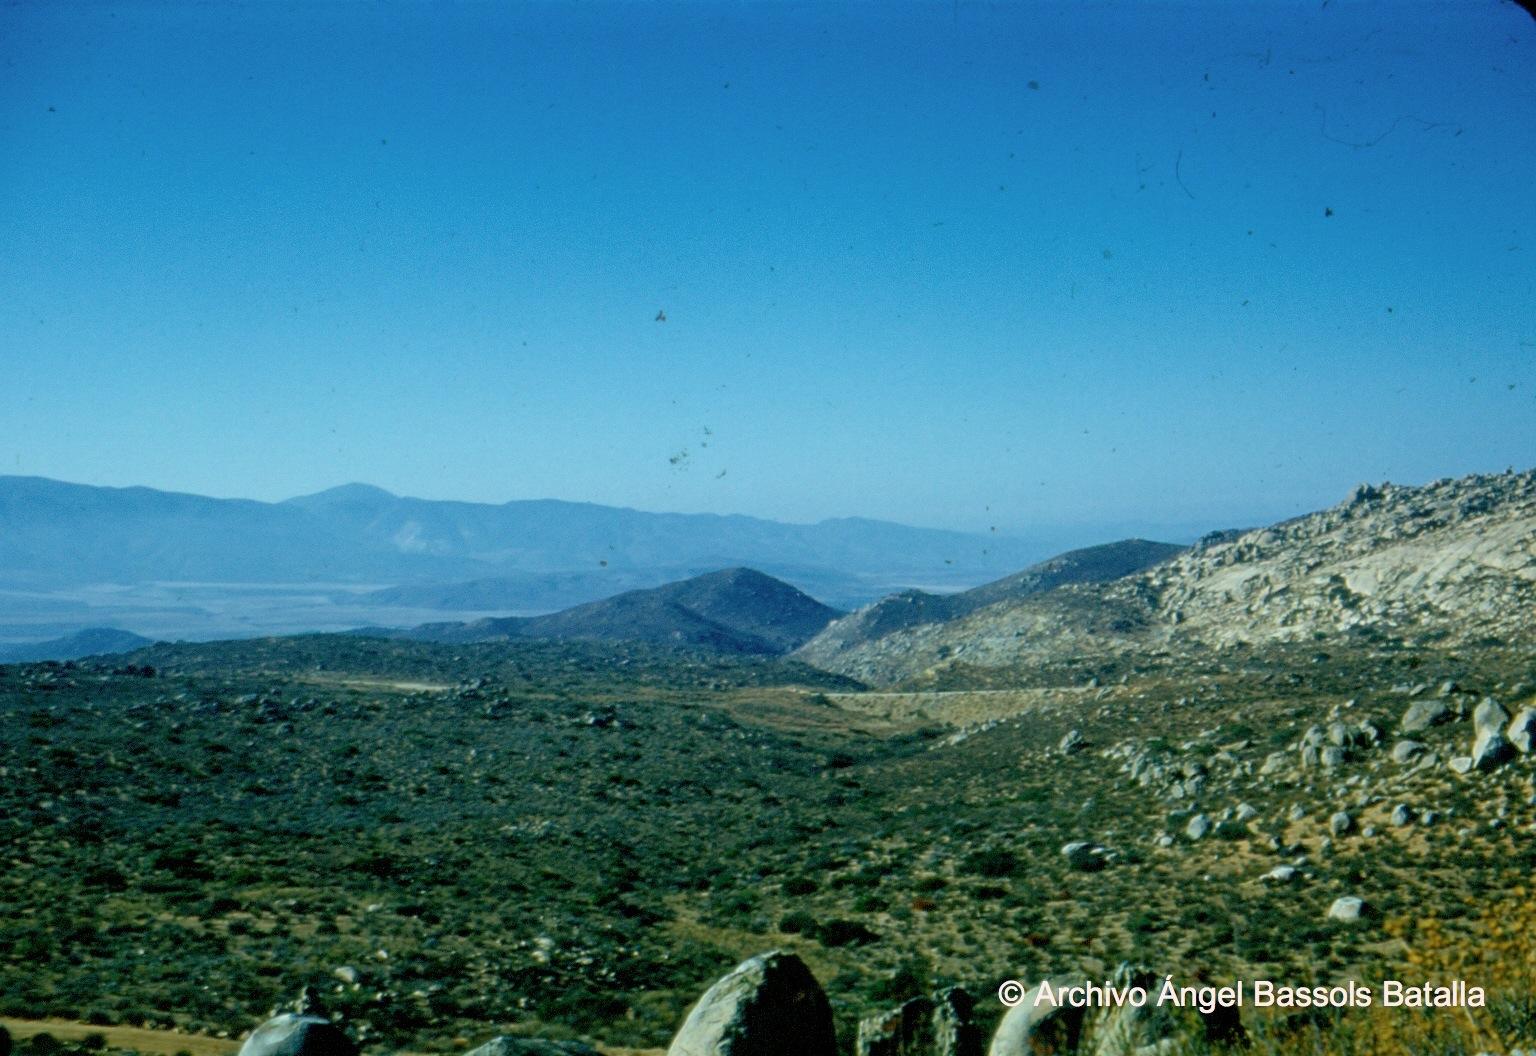 Sierra Juárez